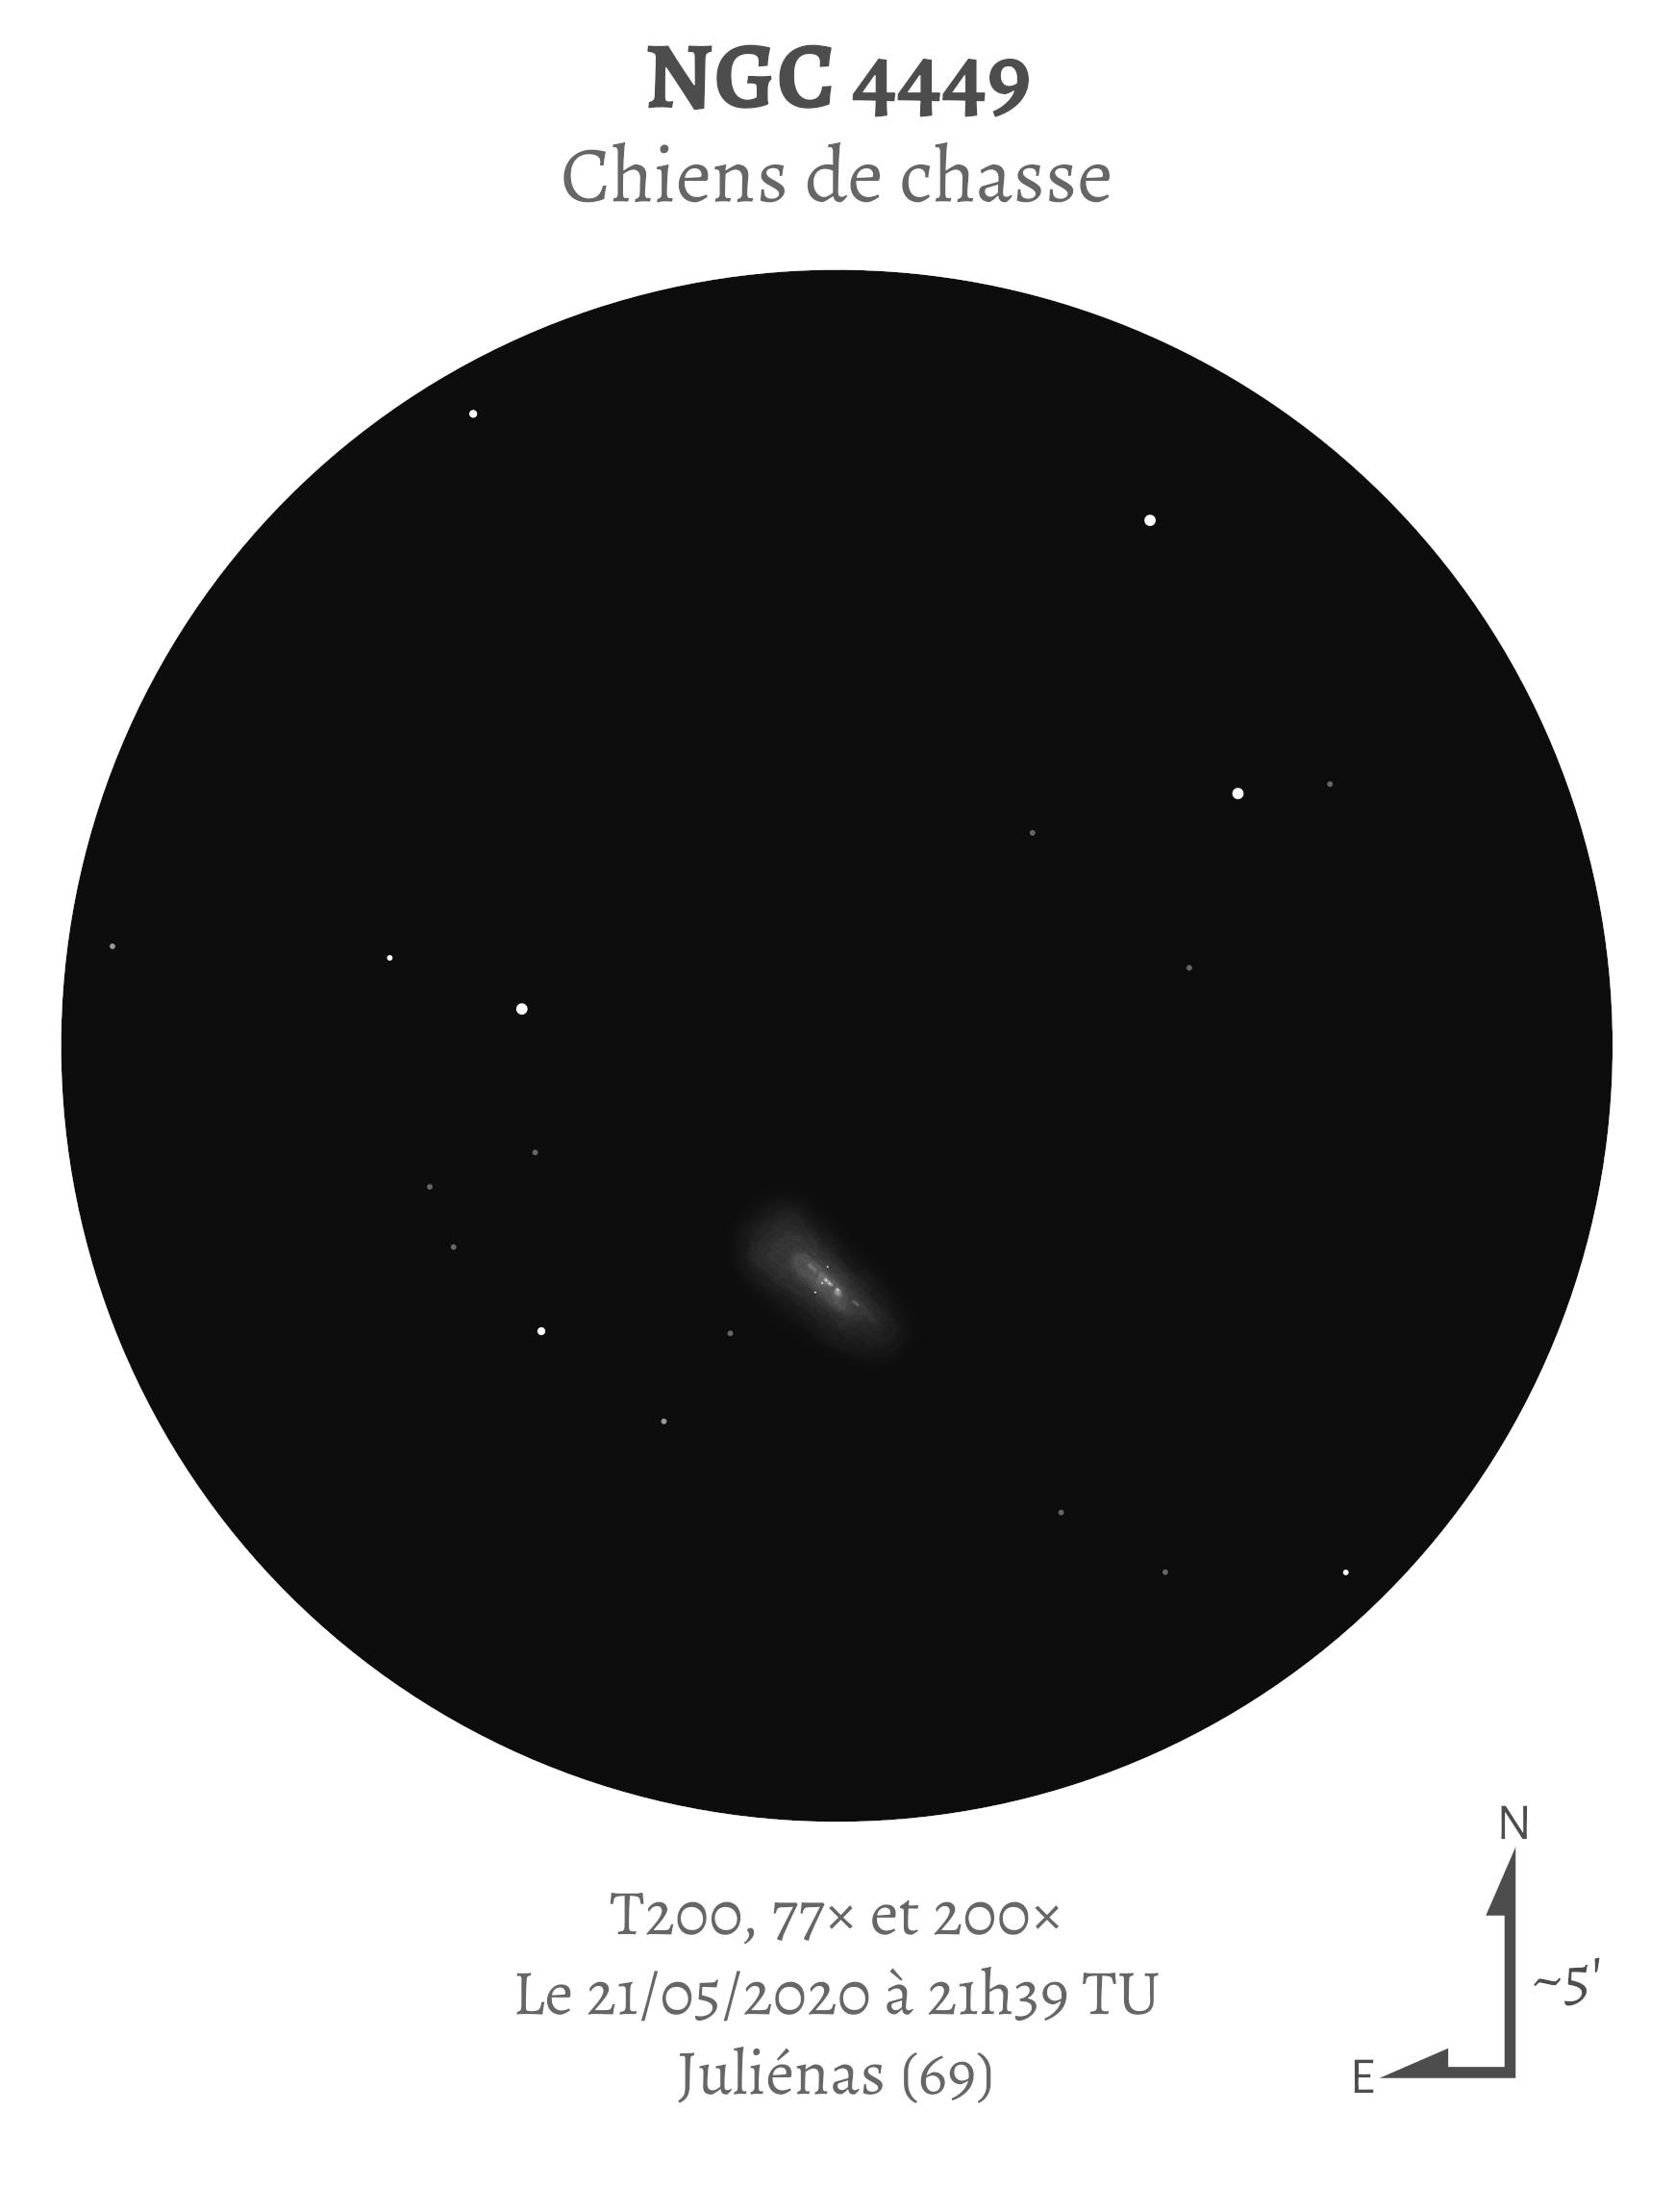 large.5ed0da09b4fe3_NGC4449-T200.png.1a41411bf774fad6191777b9287699a3.png